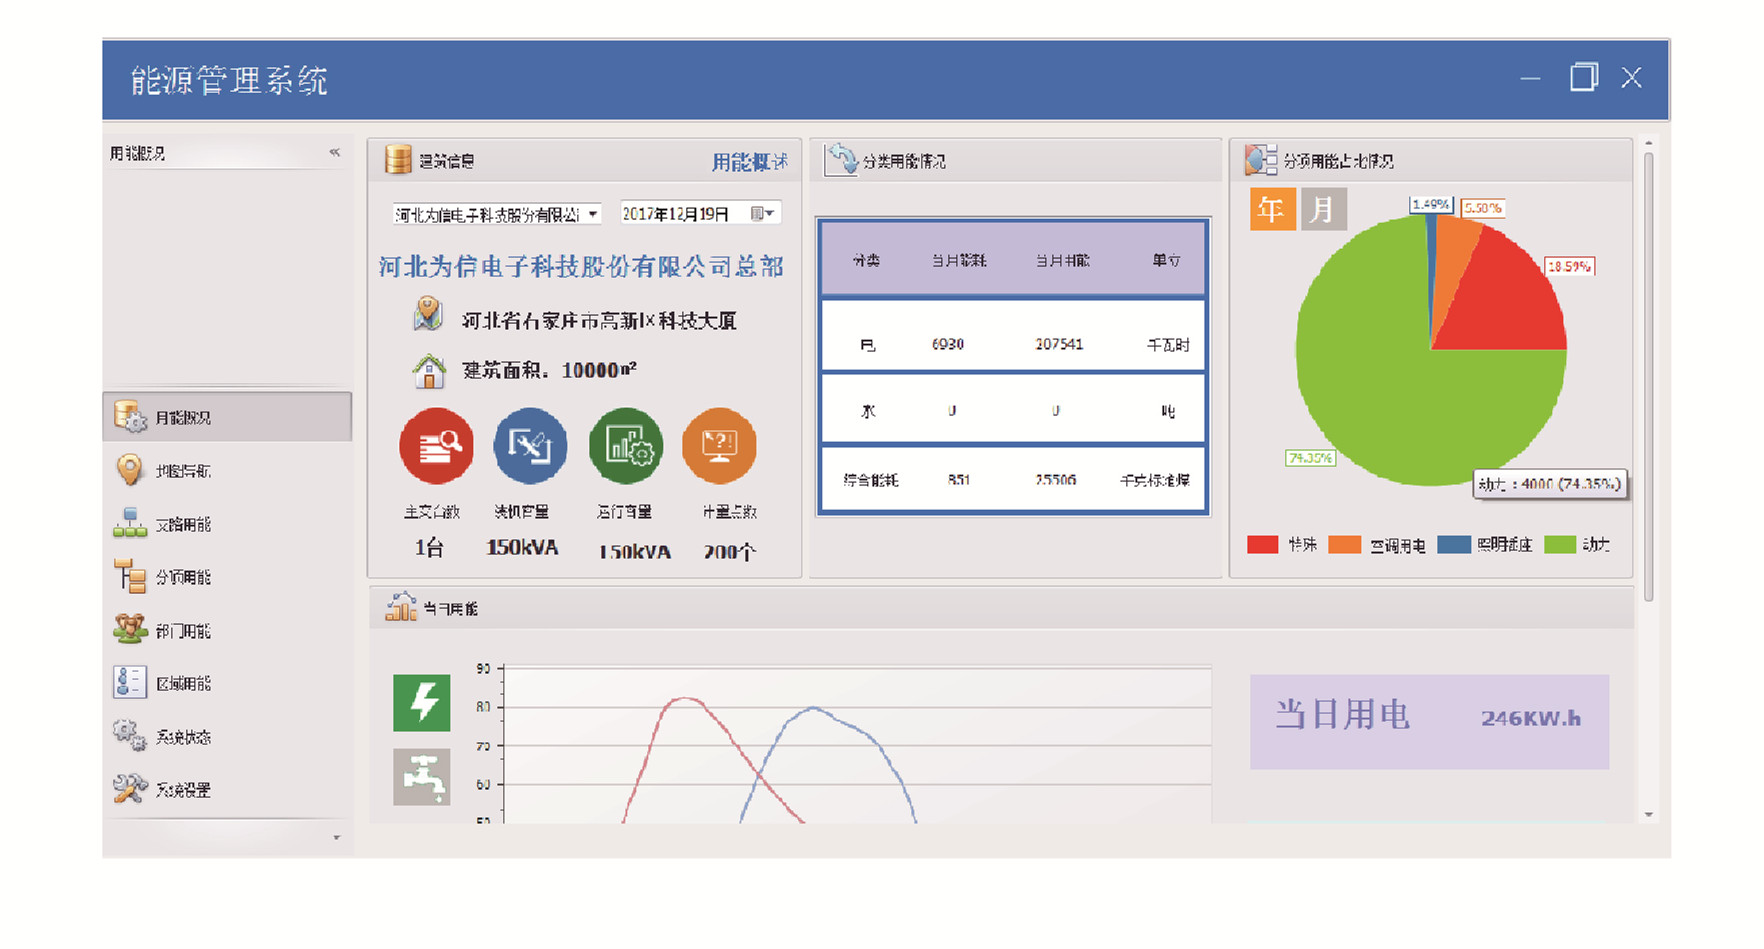 WXDK-7020能源管理監控軟件